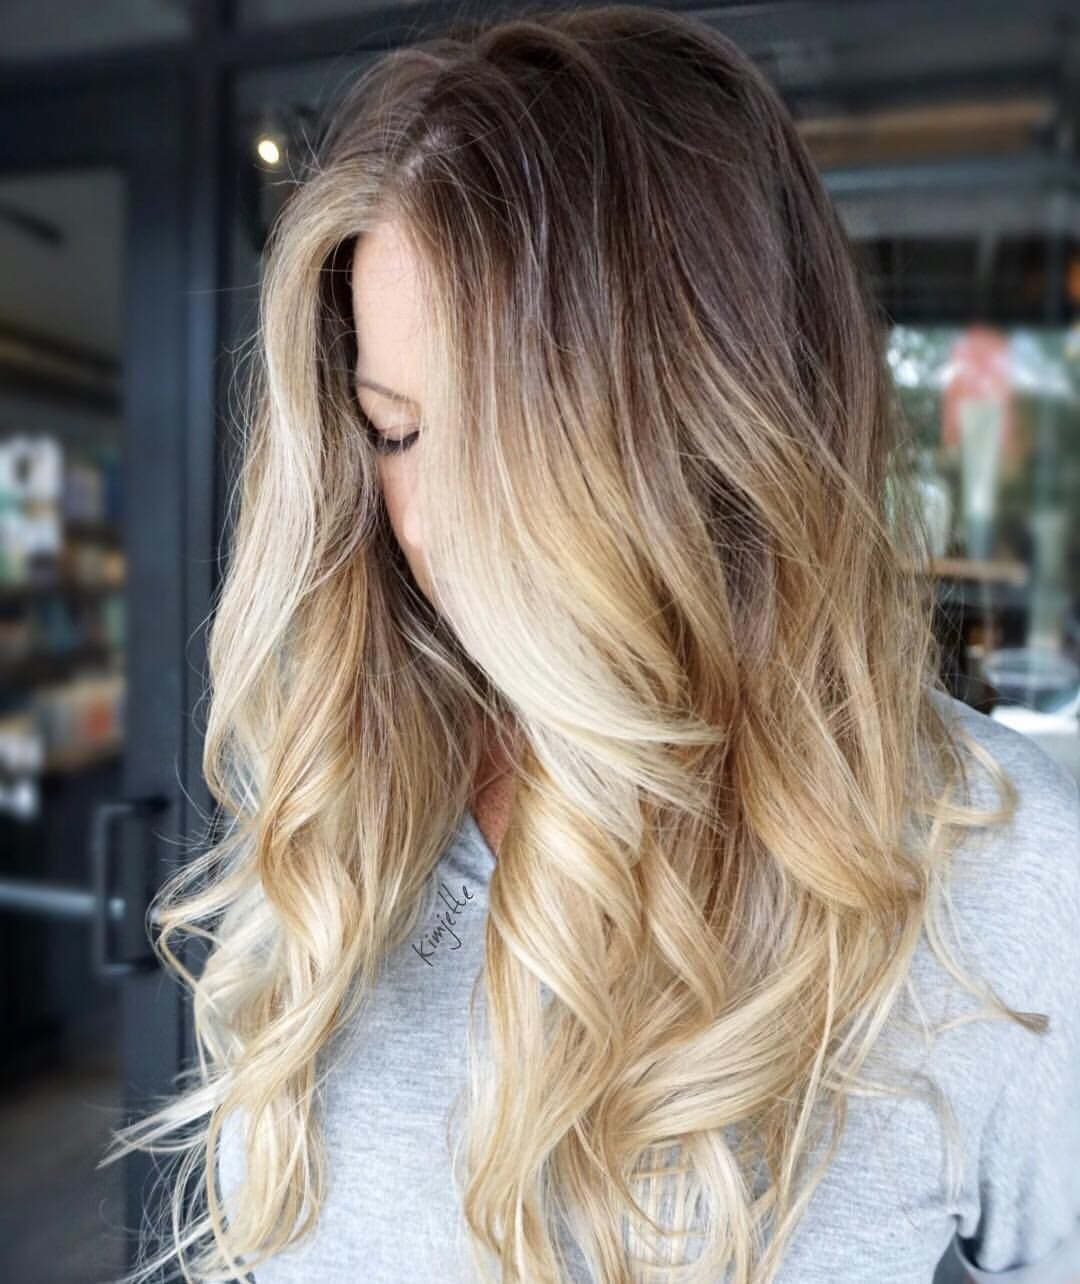 Blonde balayage #hairbykimjette @kimjettehair (at Winter Park, Florida)